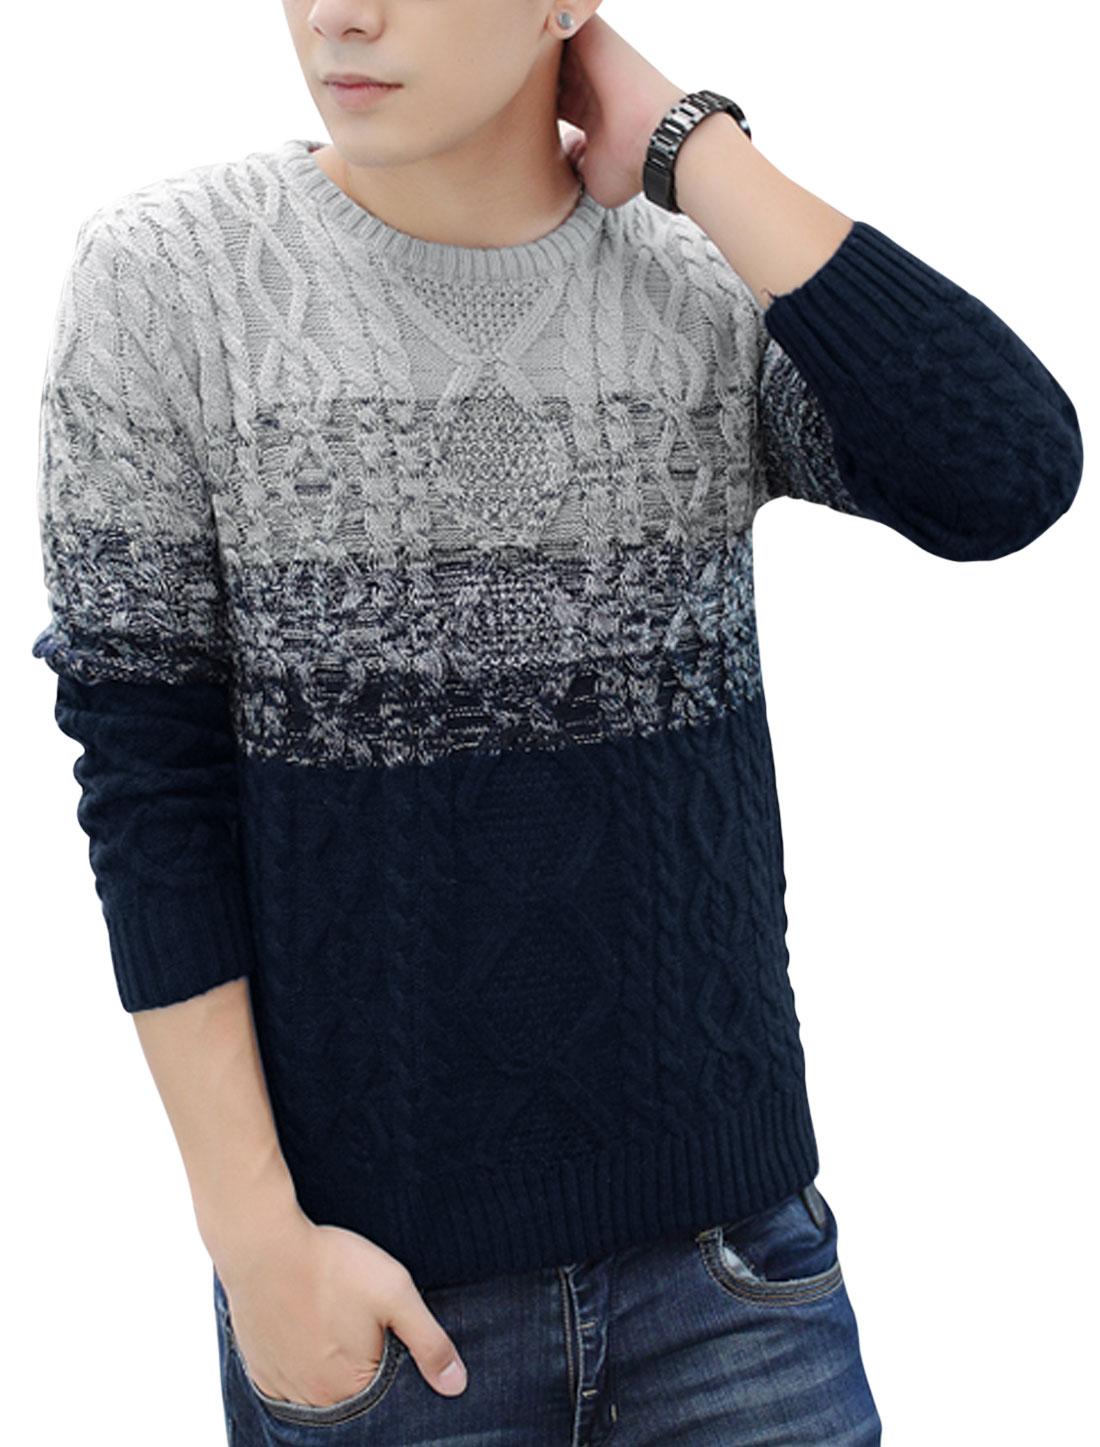 Men Round Neck Braided Design Pullover Leisure Sweater Navy Blue Light Gray S